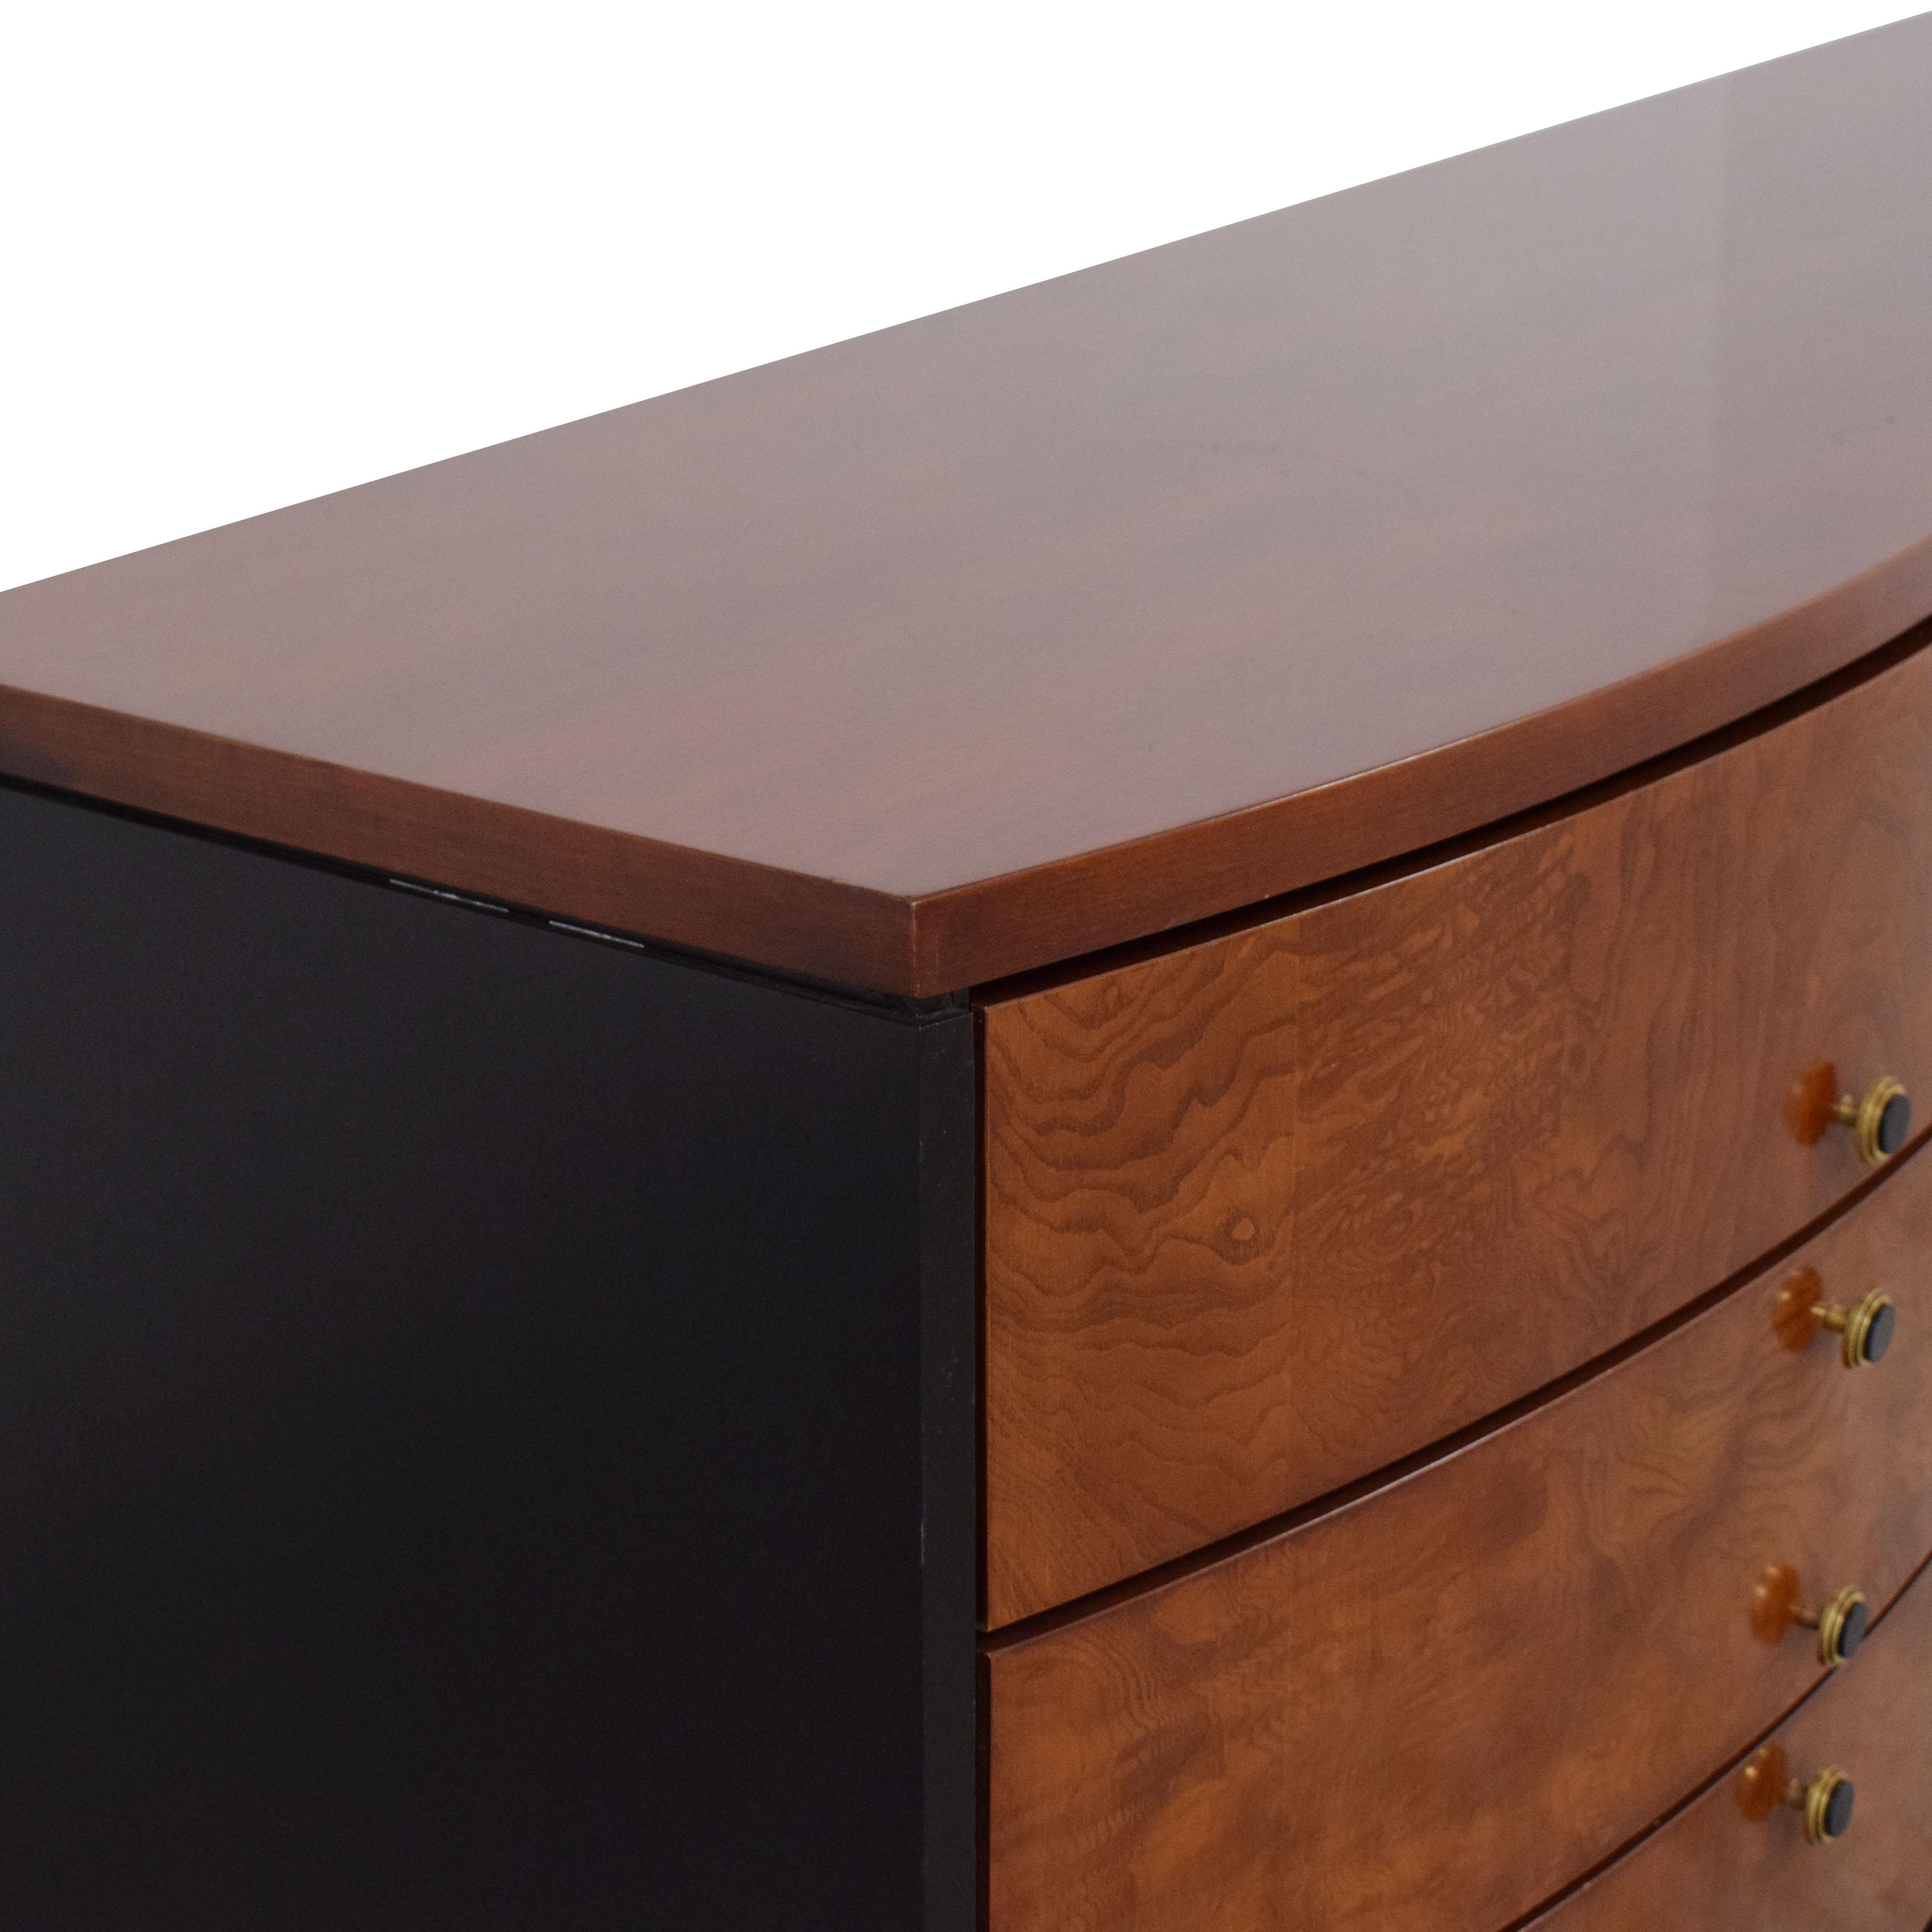 Henredon Furniture Henredon Furniture Bow Front Dresser nyc